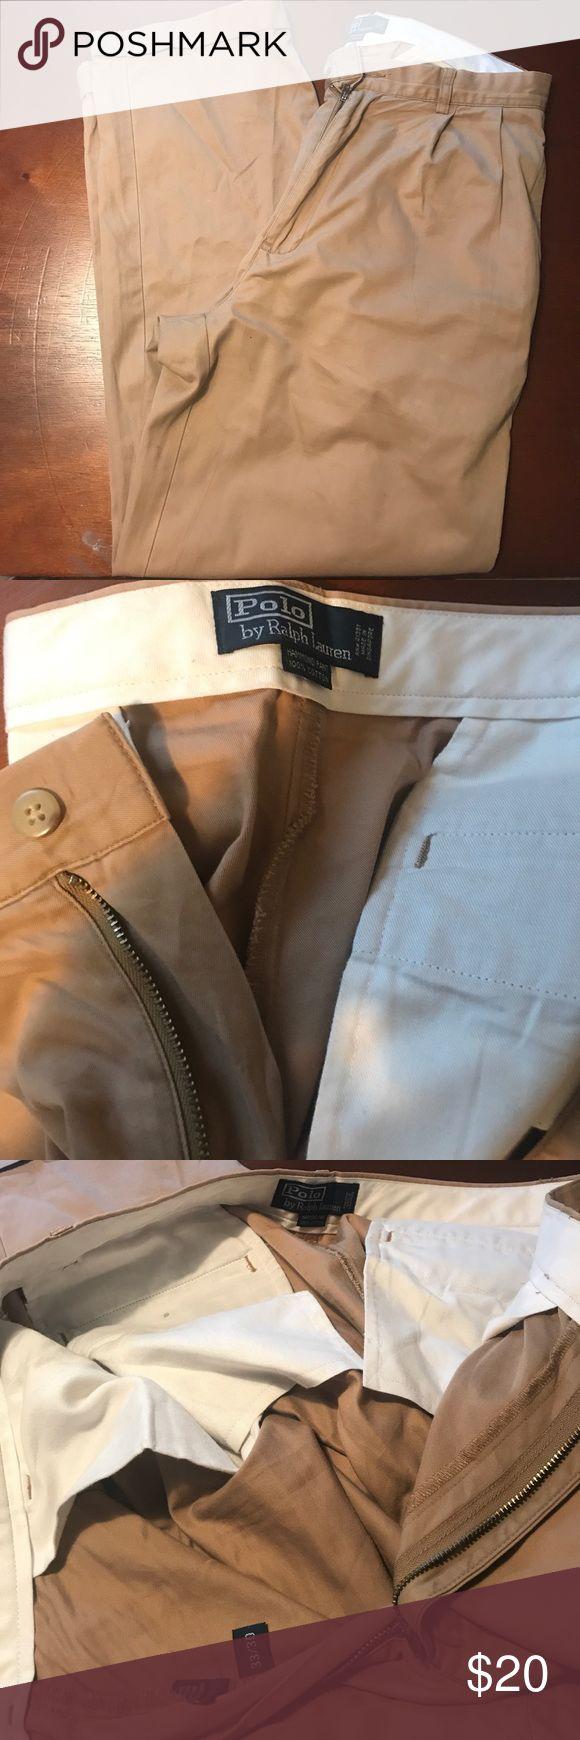 Men Khakis Polo by Ralph Lauren Men Khakis Polo by Ralph Lauren. Size: Waist- 33 Length- 30 (gently used) Polo by Ralph Lauren Pants Chinos & Khakis